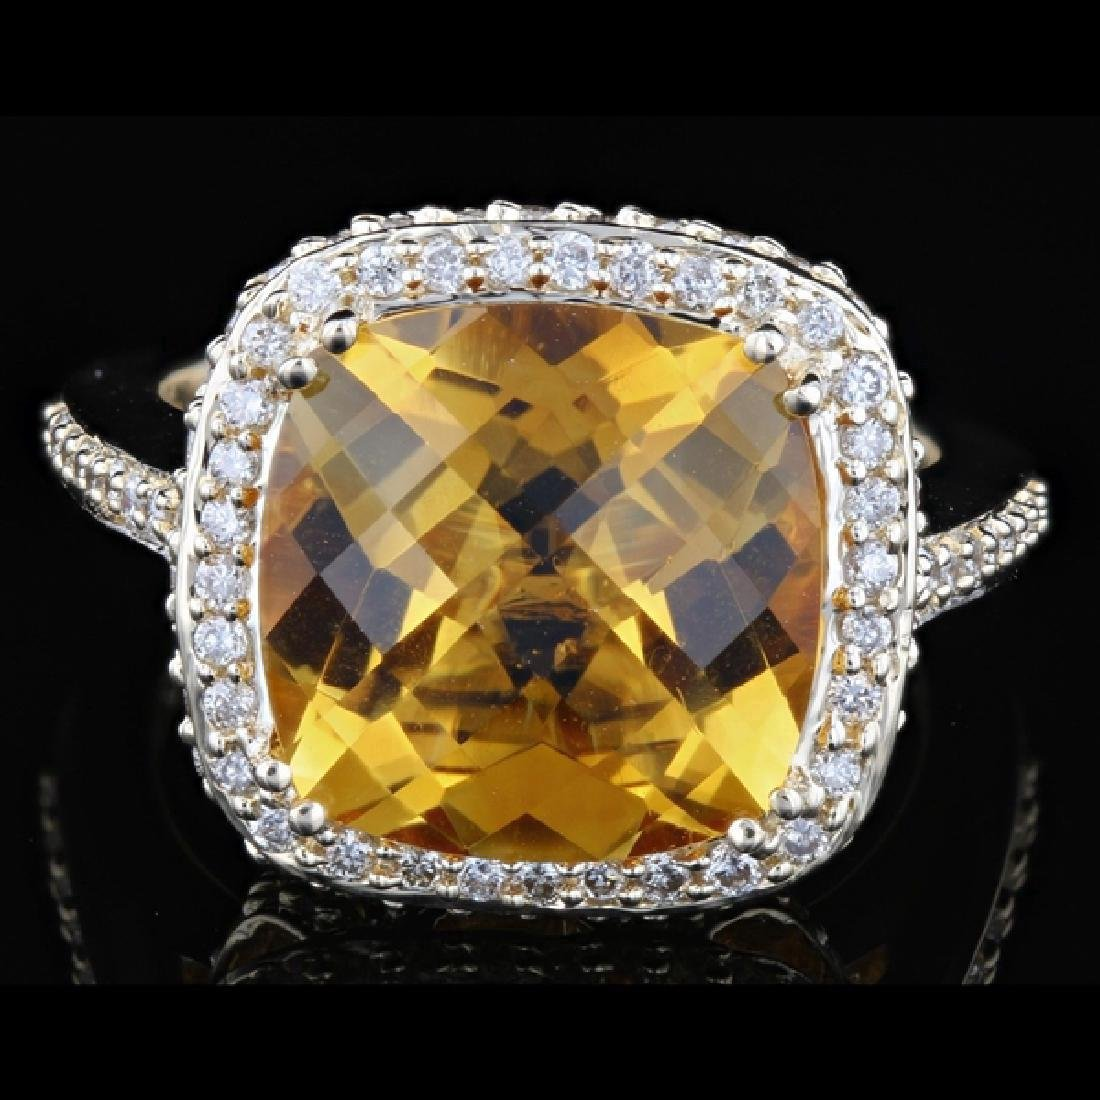 Contemporary 14k 8.40ctw Citrine & 1.46ctw Diamond Ring